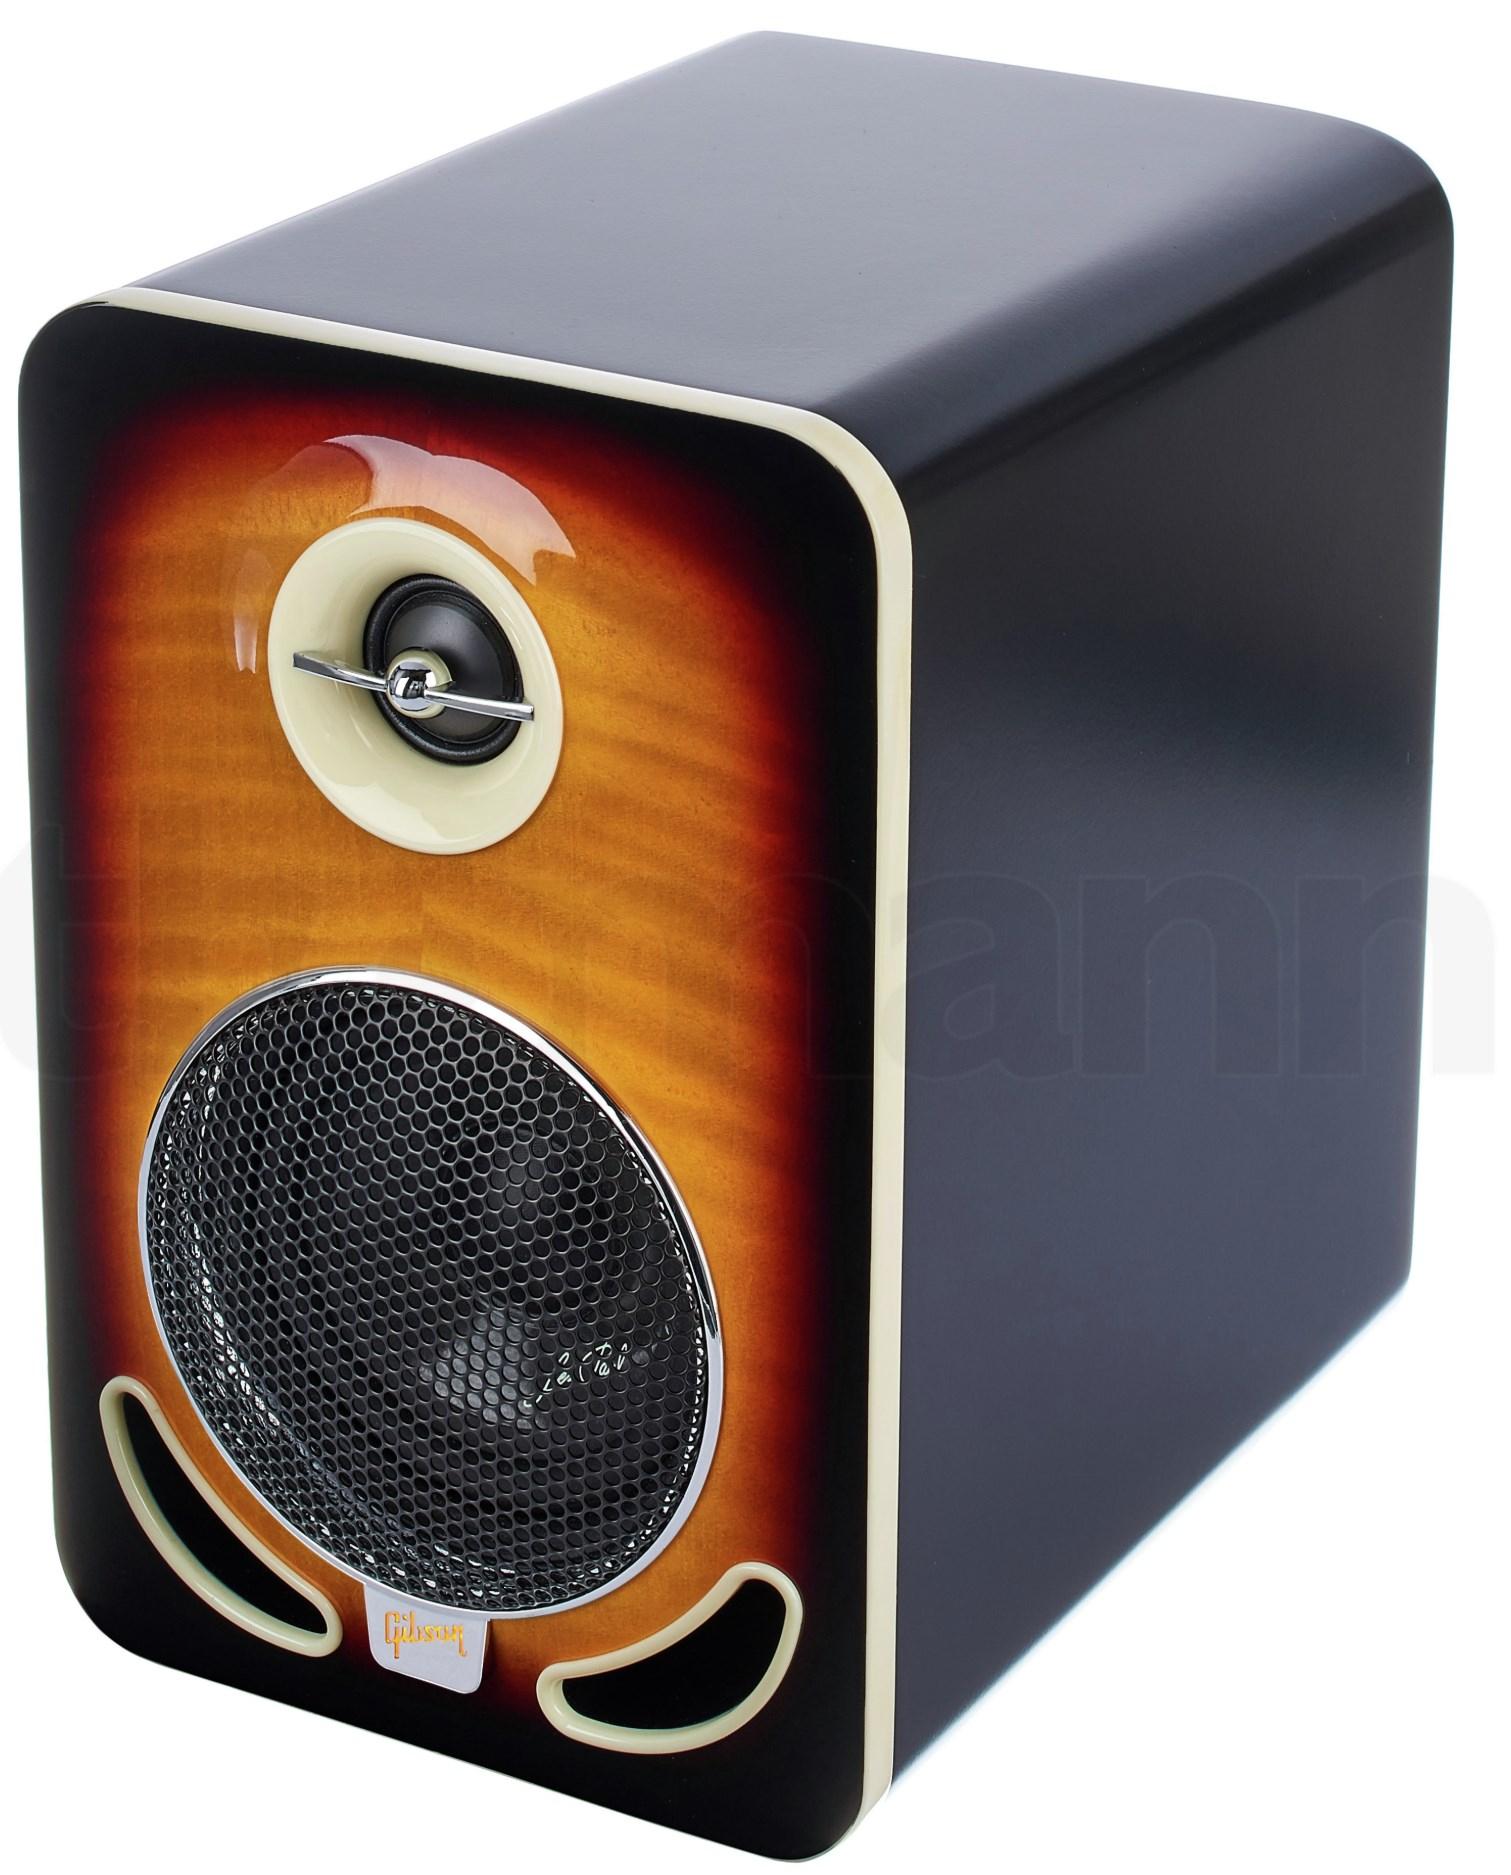 Enceinte monitoring Gibson Les Paul active